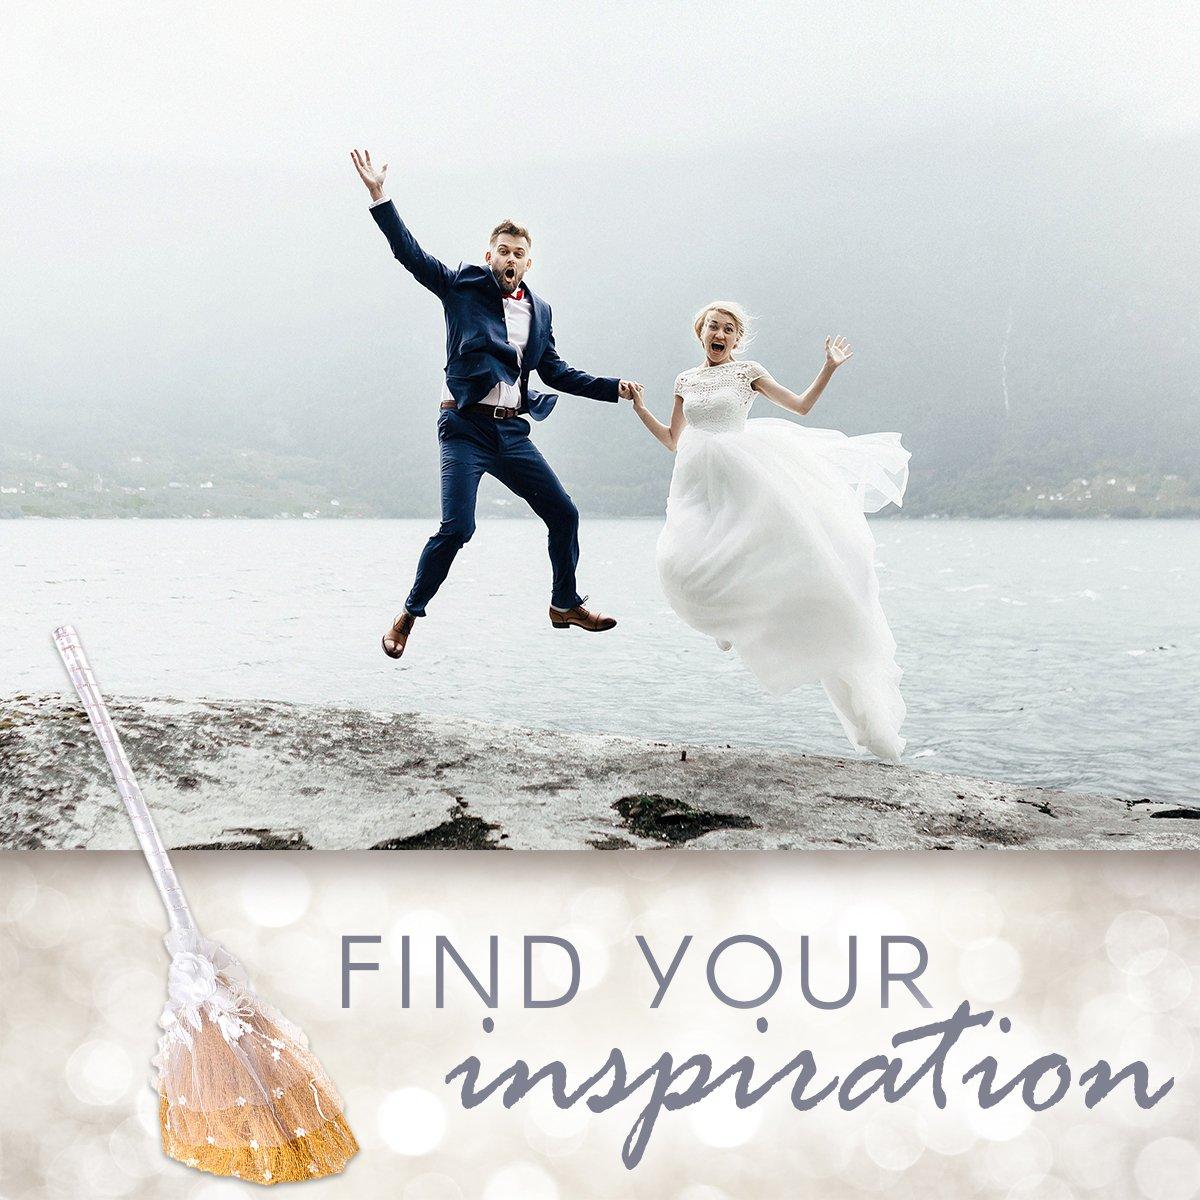 Amazon Darice Vl3080 Wedding Jump Broom Decorated 32 Inch